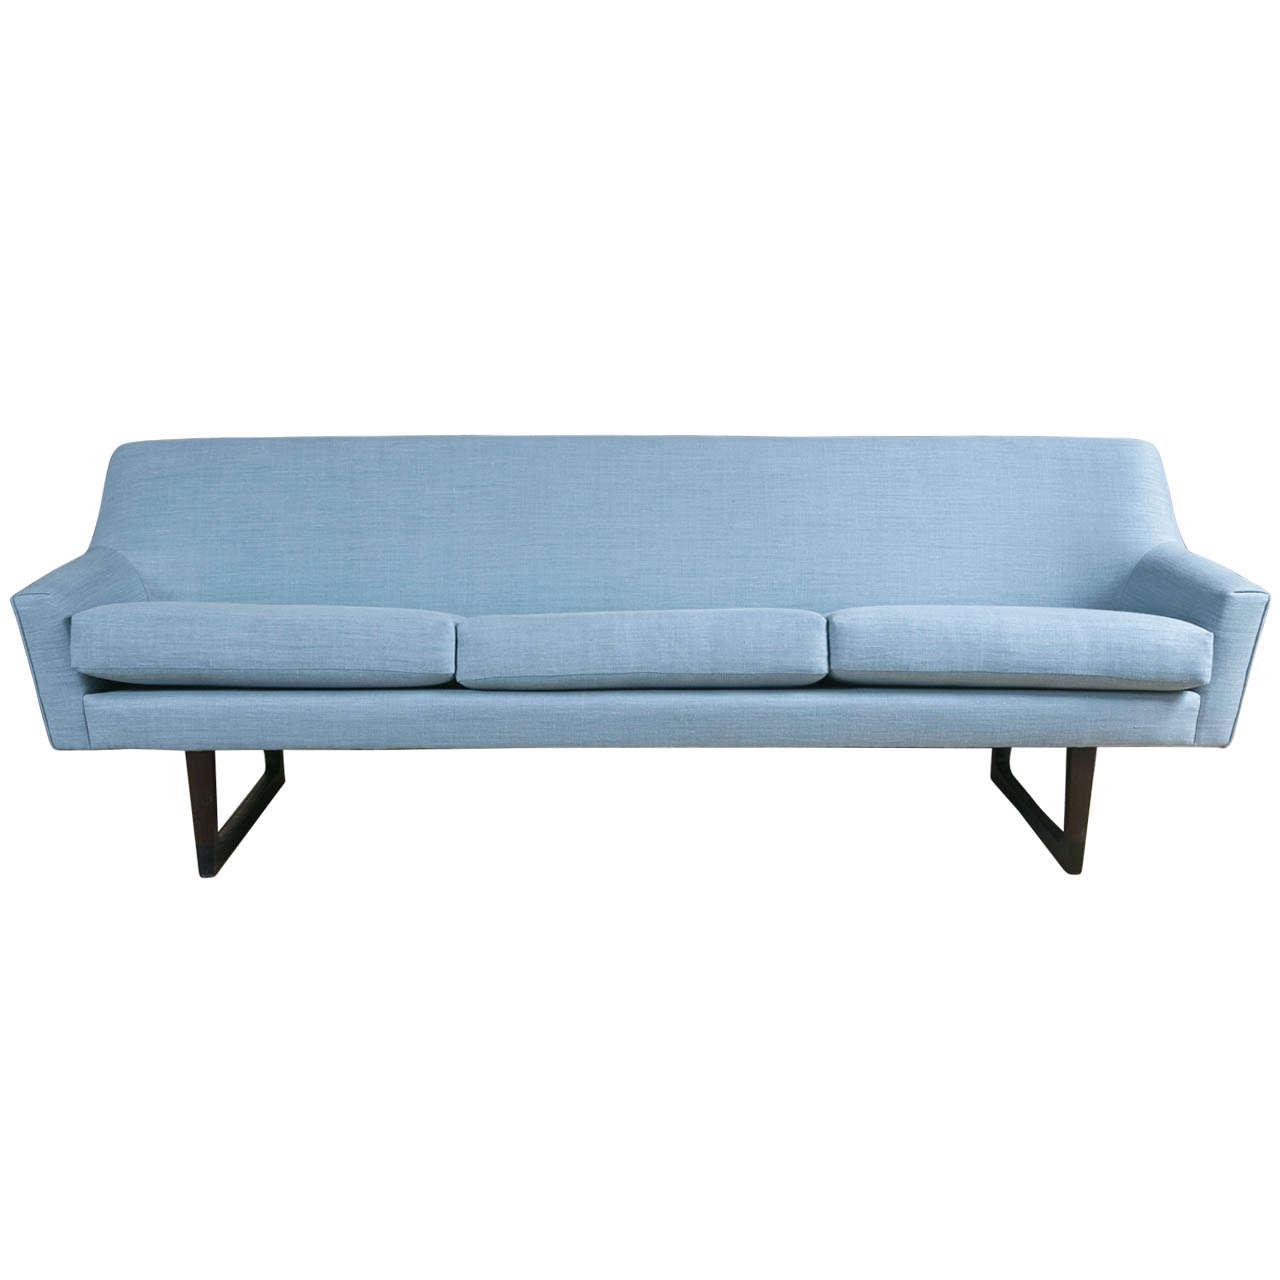 Danish Modern Sofas: Mid-century Danish Modern Sofa At 1stdibs